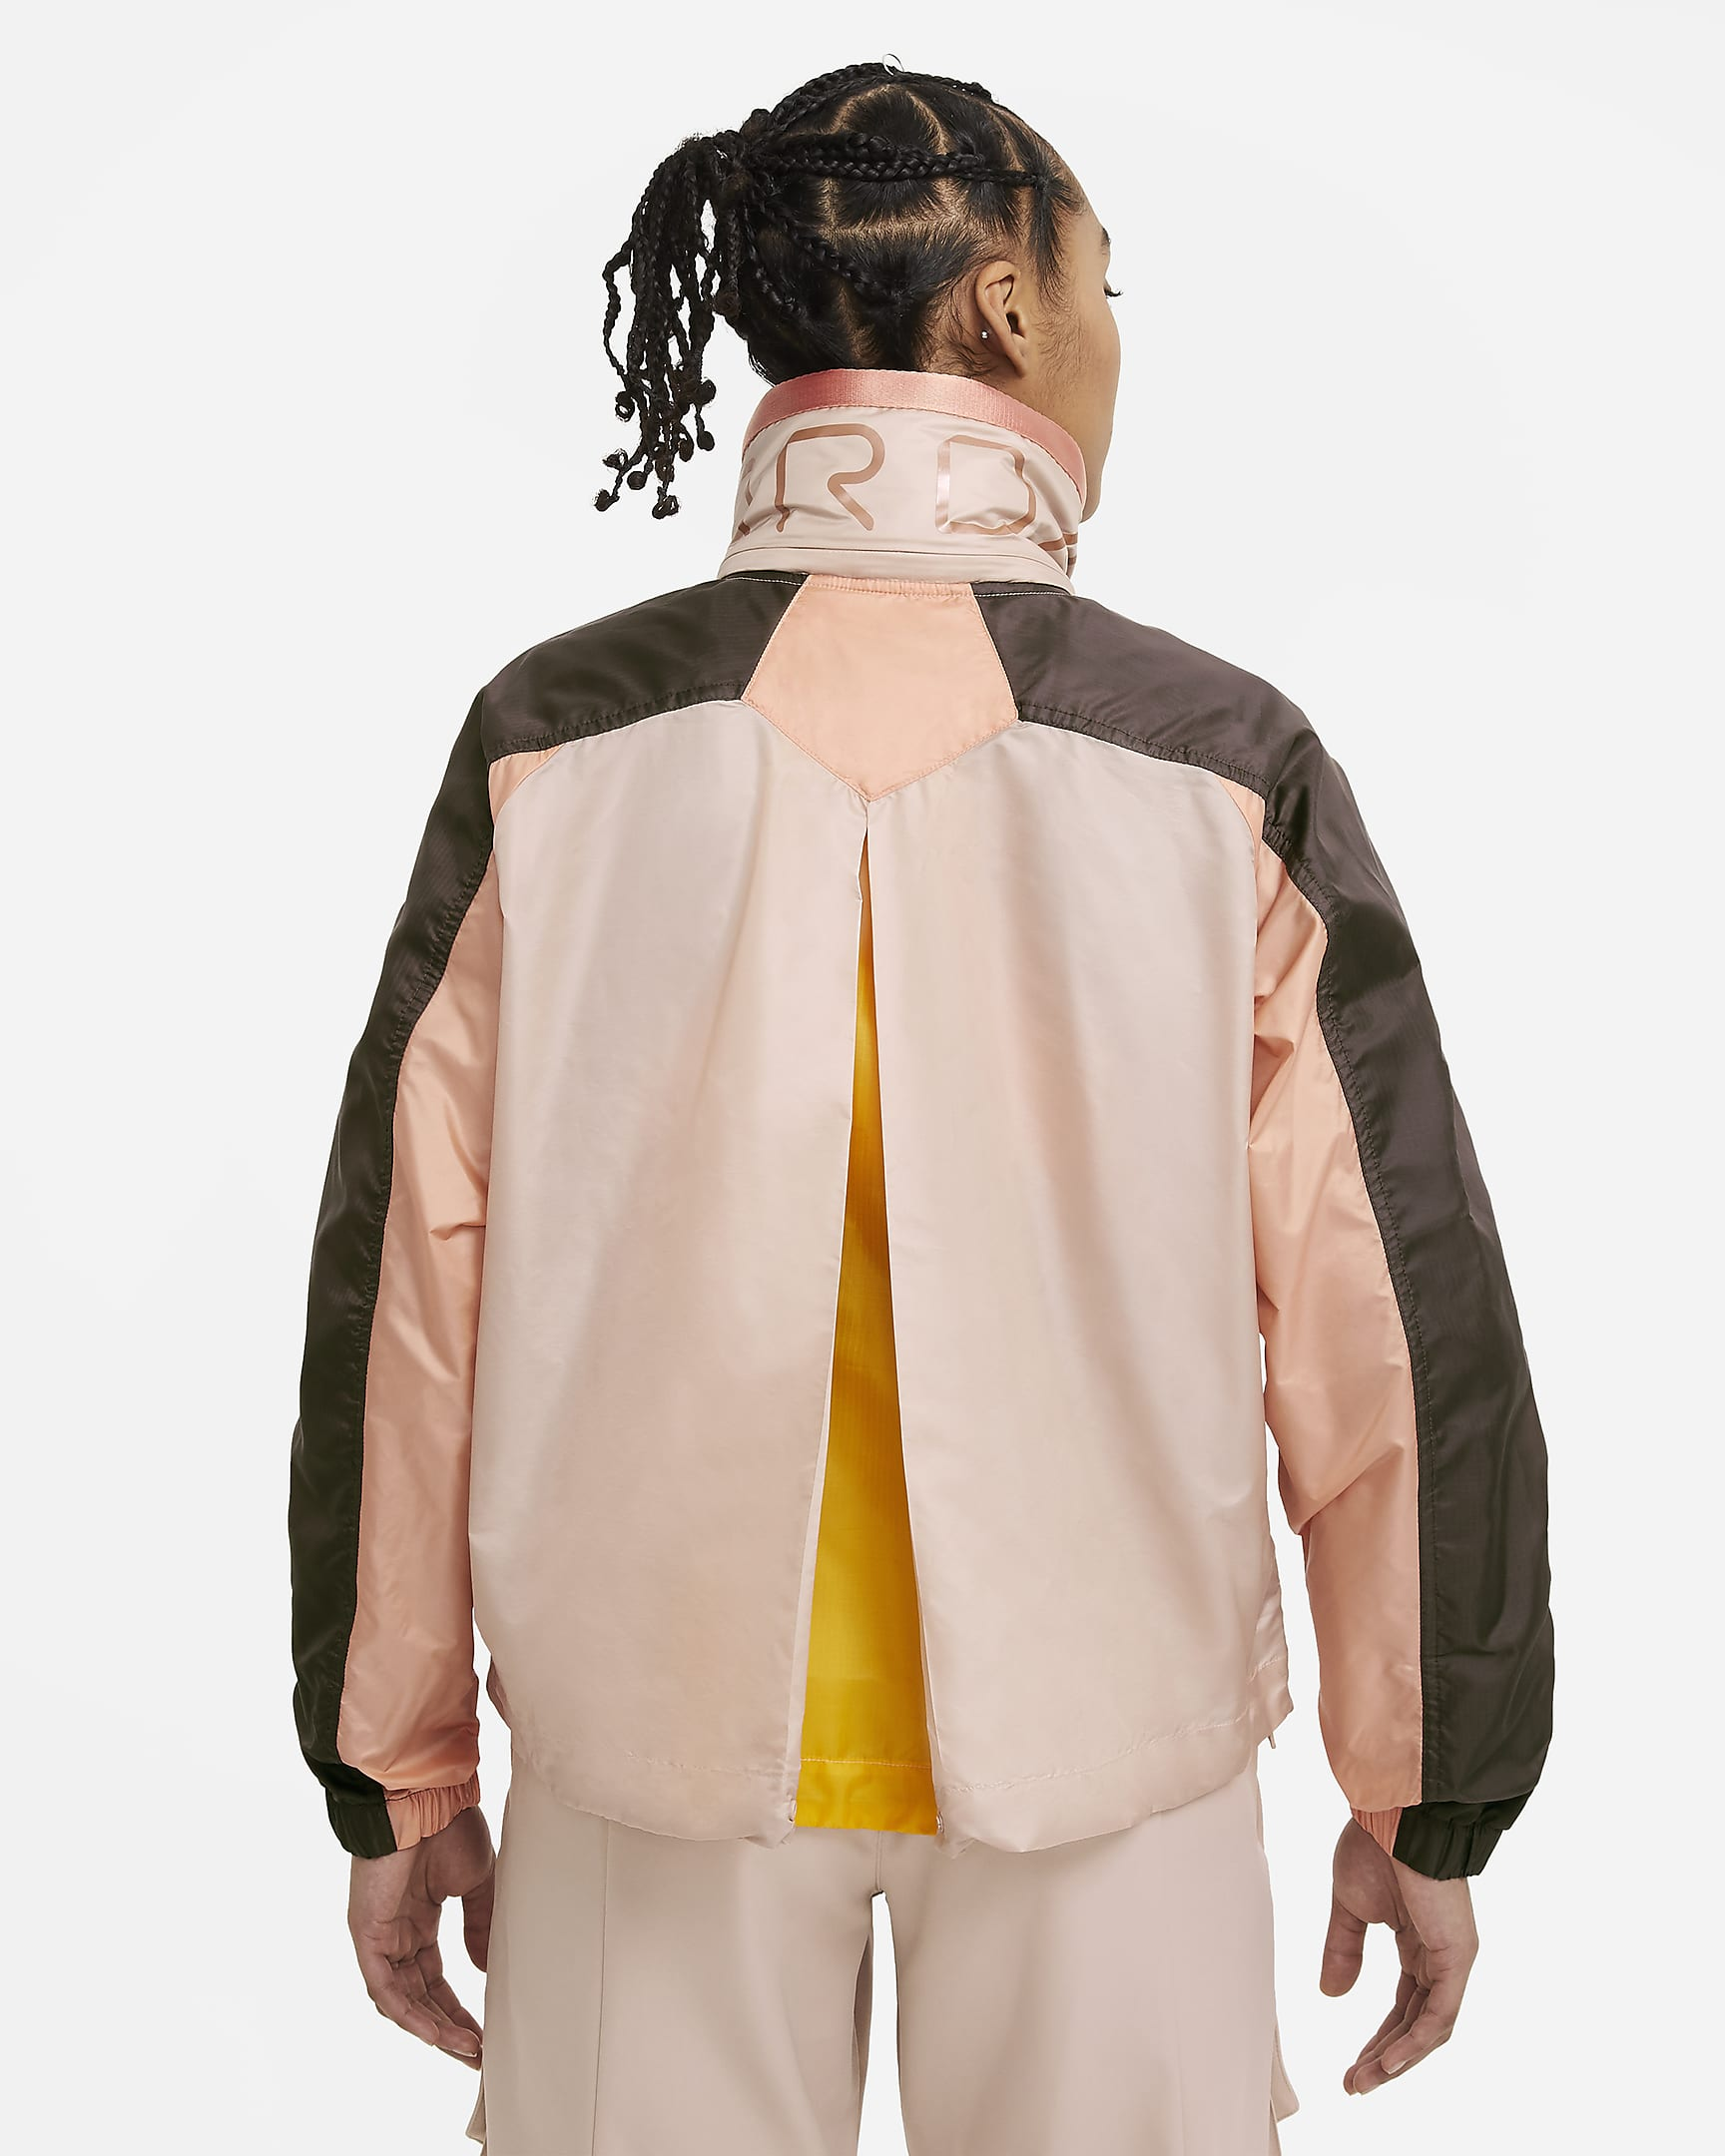 jordan-future-primal-womens-lightweight-jacket-S7Cnt0-2